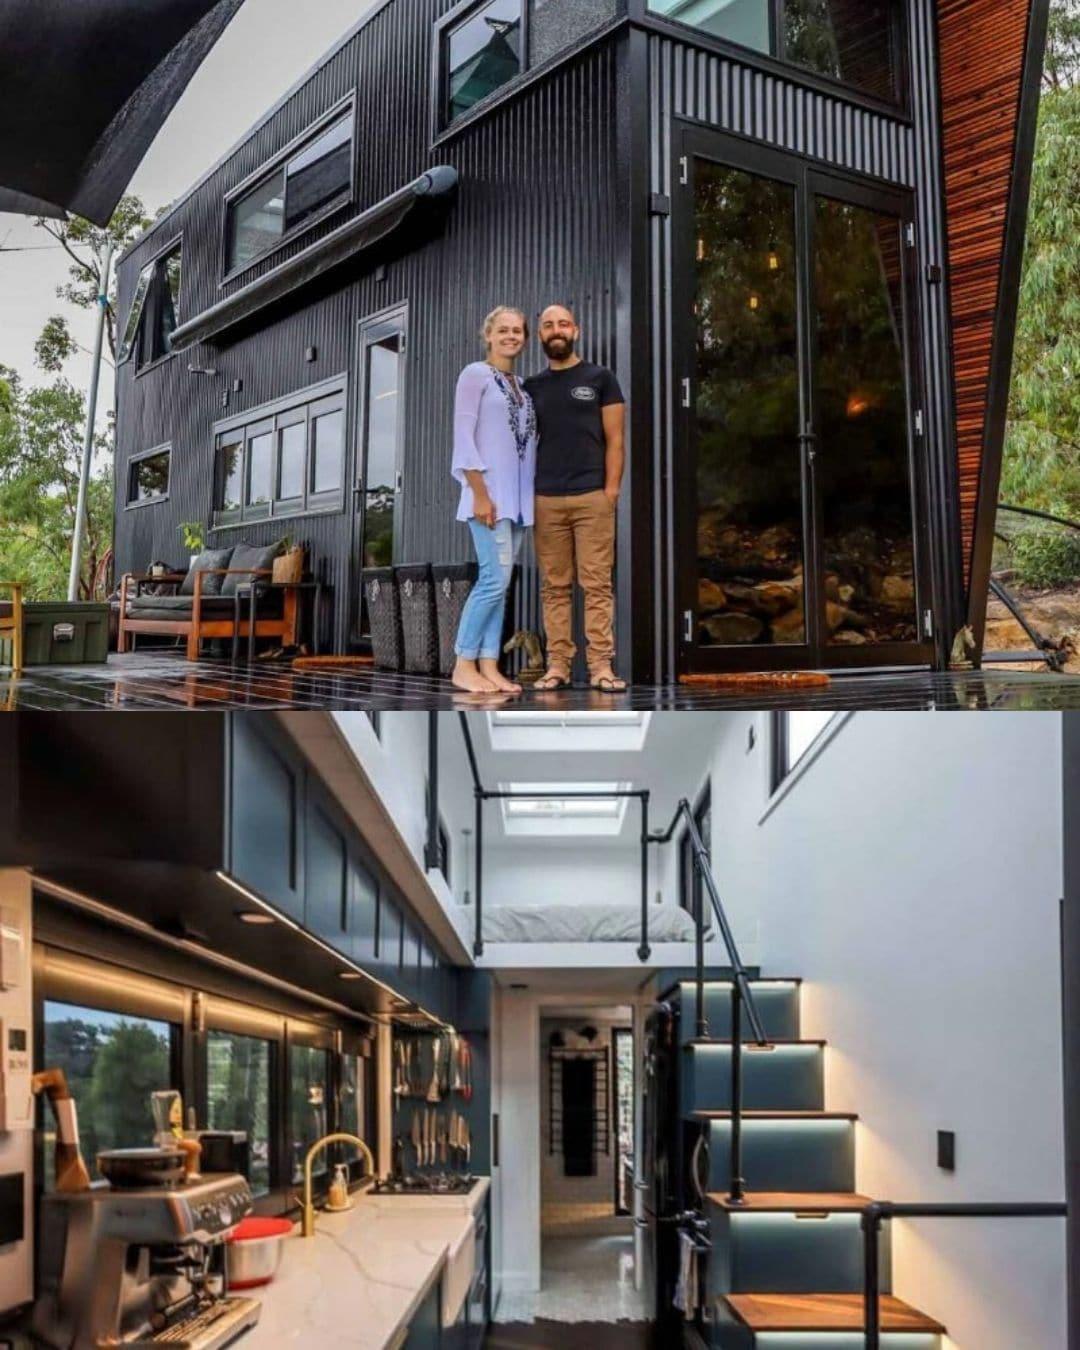 The Blue Mountains Luxury Tiny House